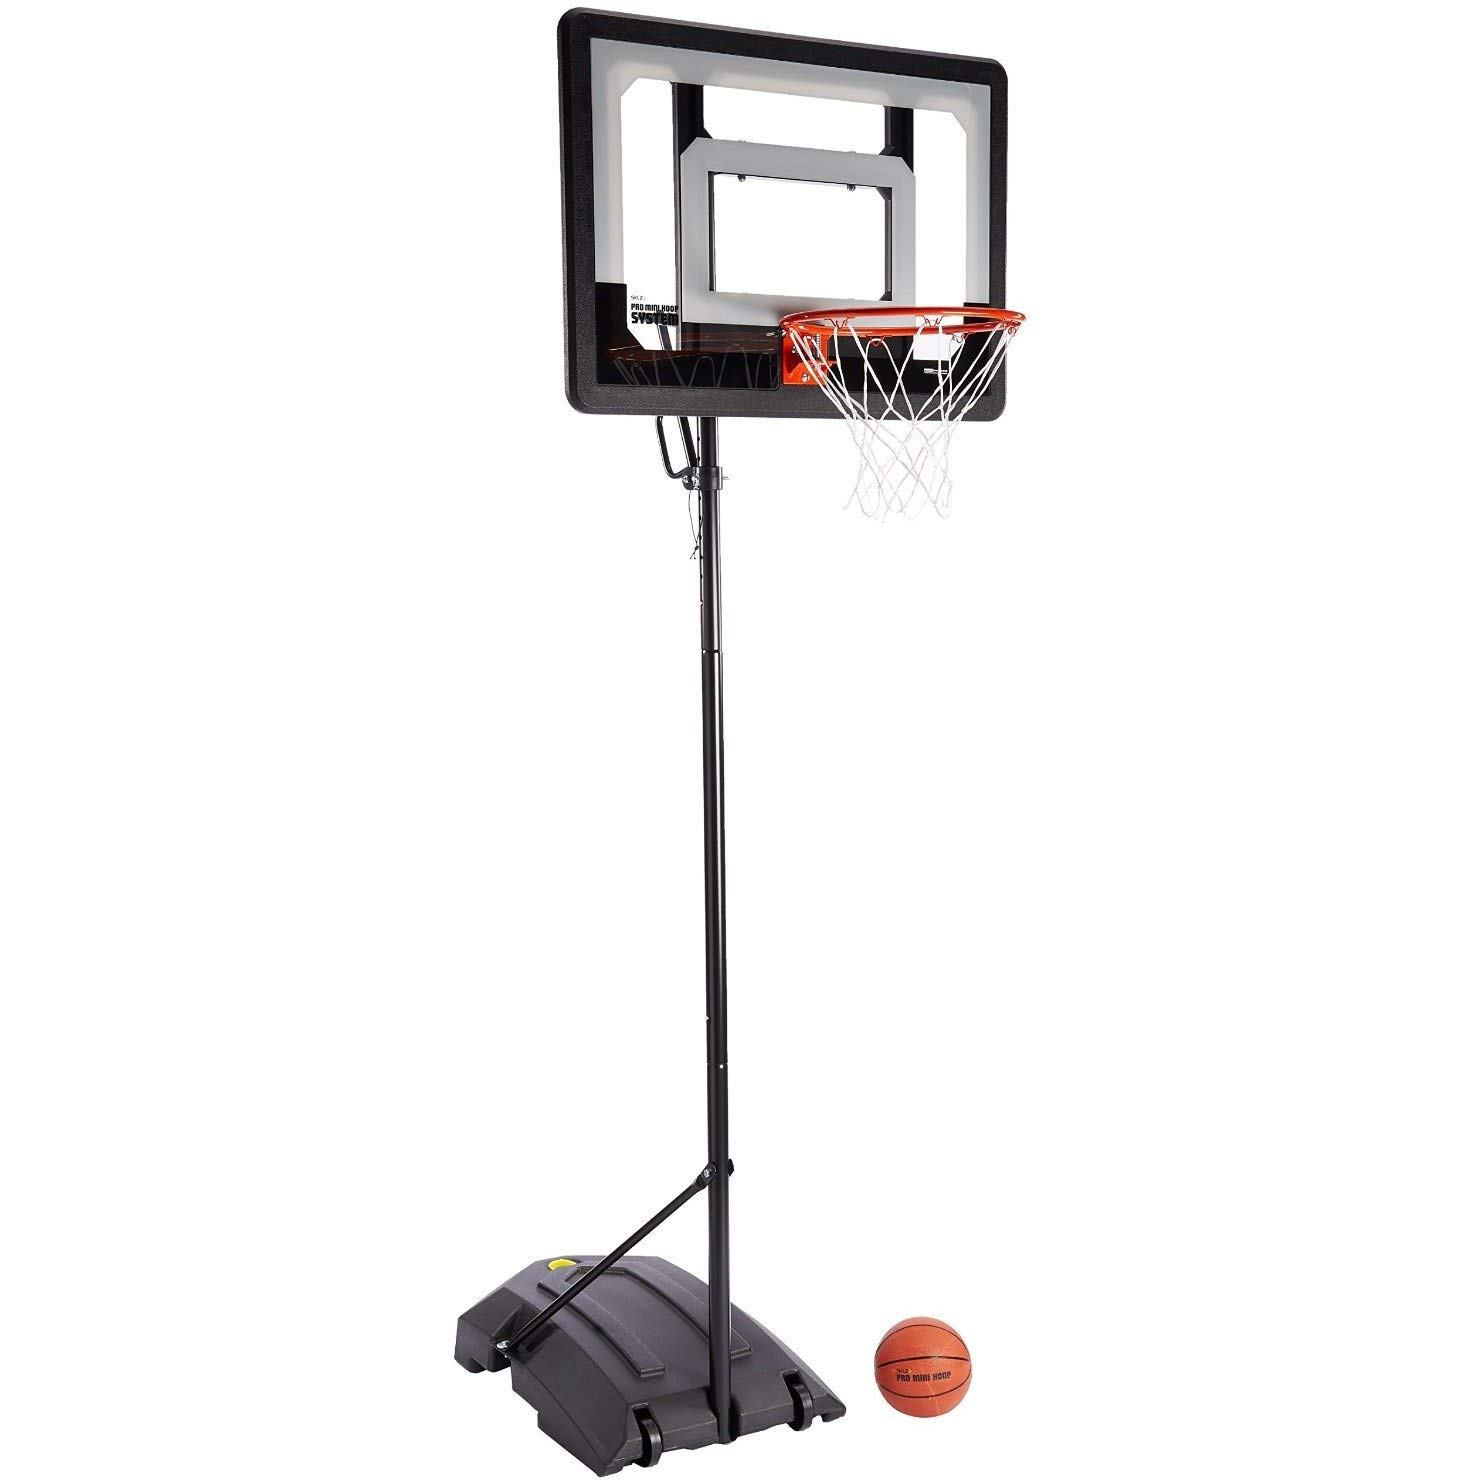 "SKLZ Pro Mini Basketball Hoop System. Adjustable Height 3.5 ft. -7 ft. and 7"" Mini Ball. (Renewed) by SKLZ (Image #1)"